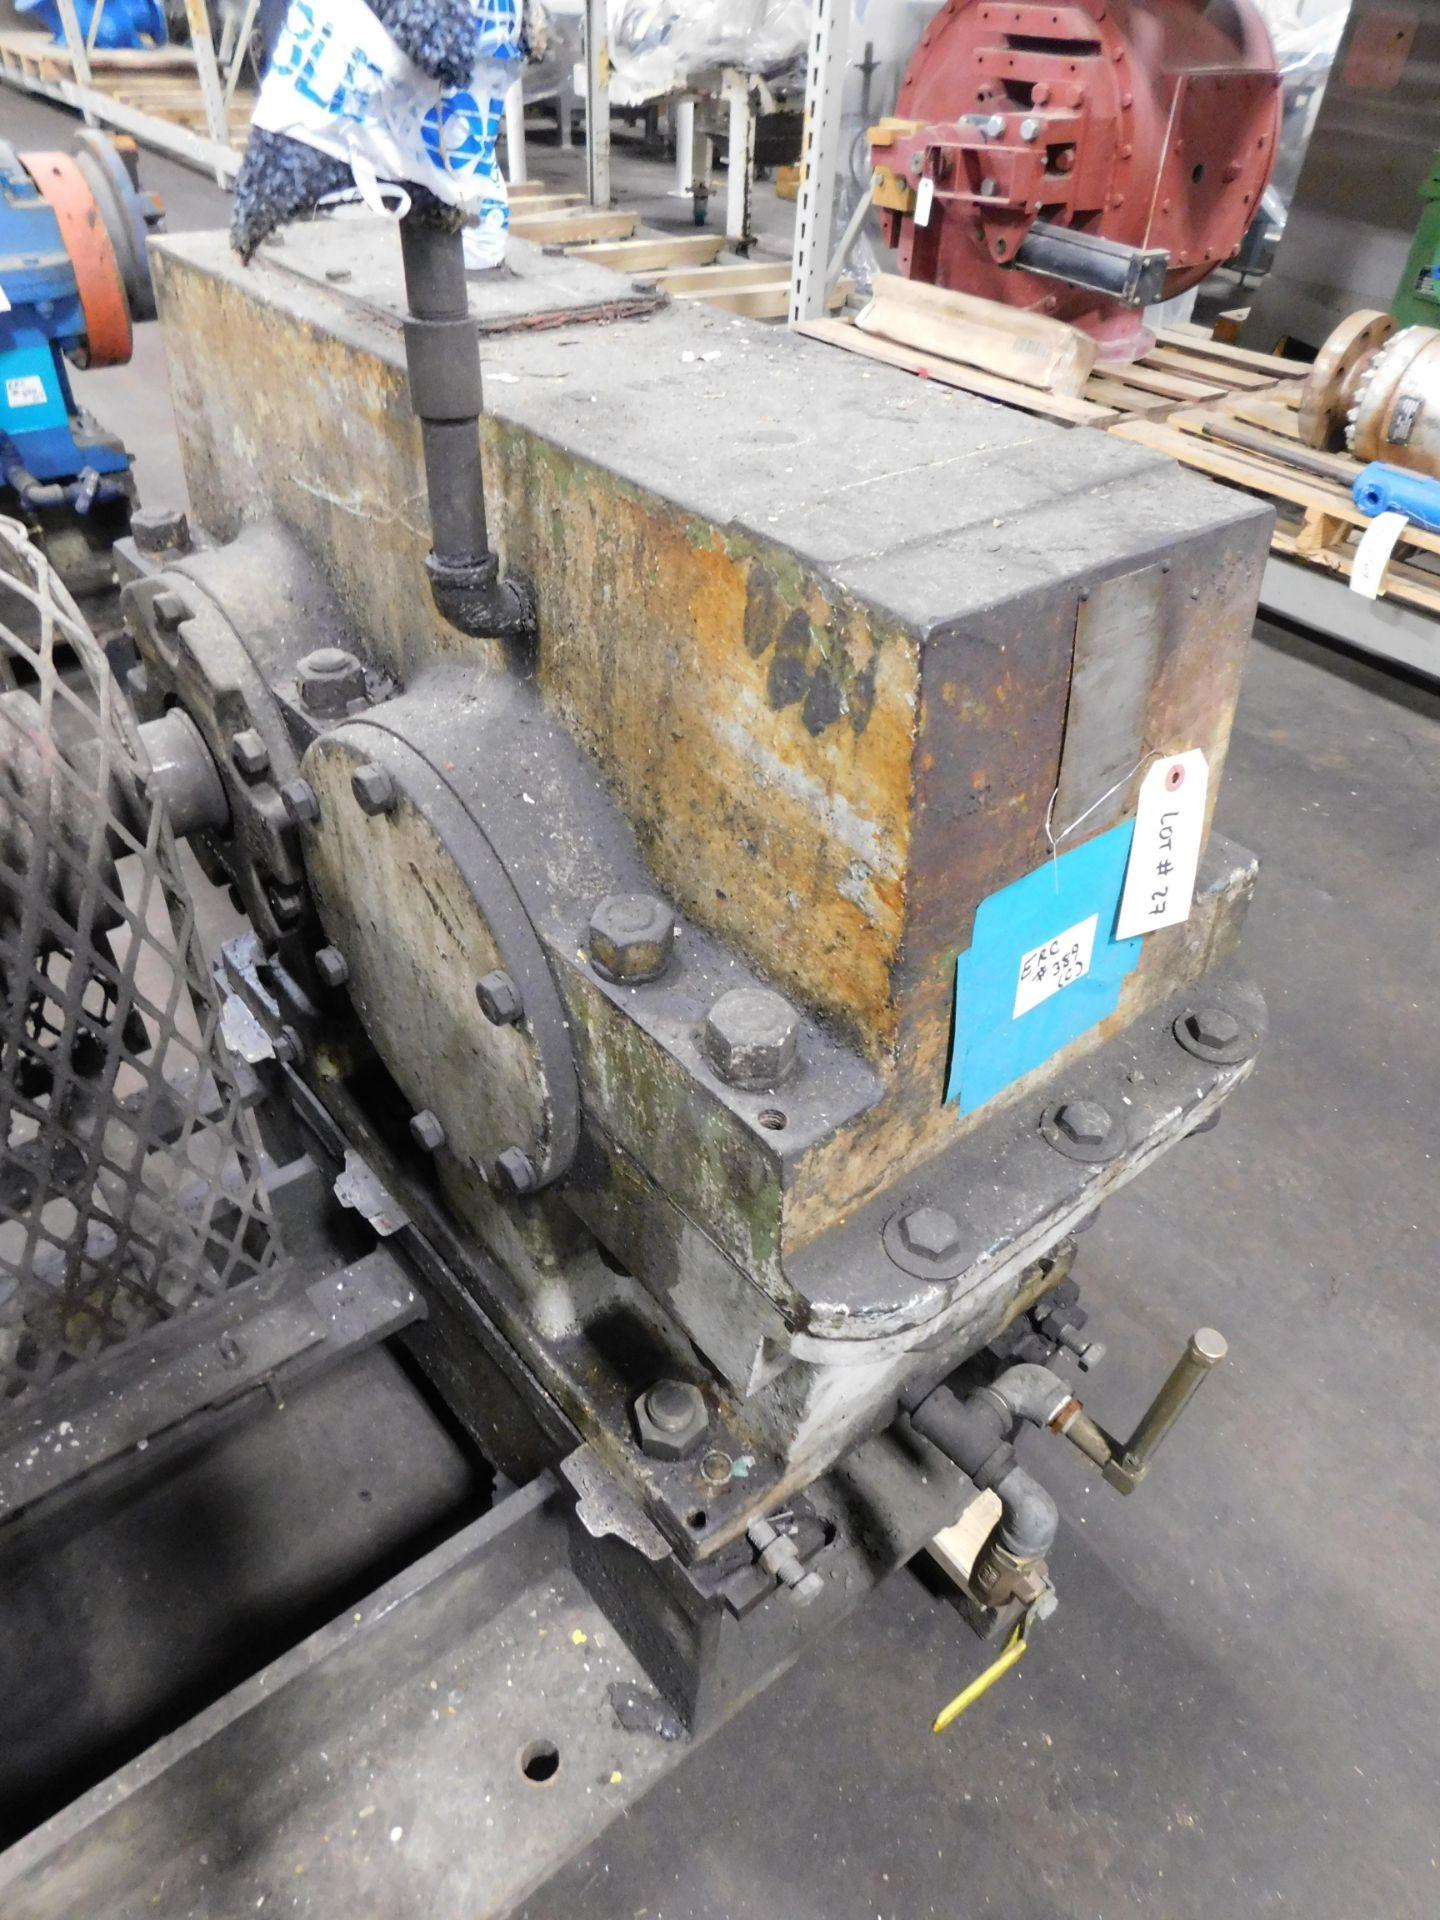 Reliance AC Duty Master Motor. 900 HP. 3 Ph. 60 Hz. 4160 V. 1789 RPM. 6809S. Type P. - Image 5 of 7